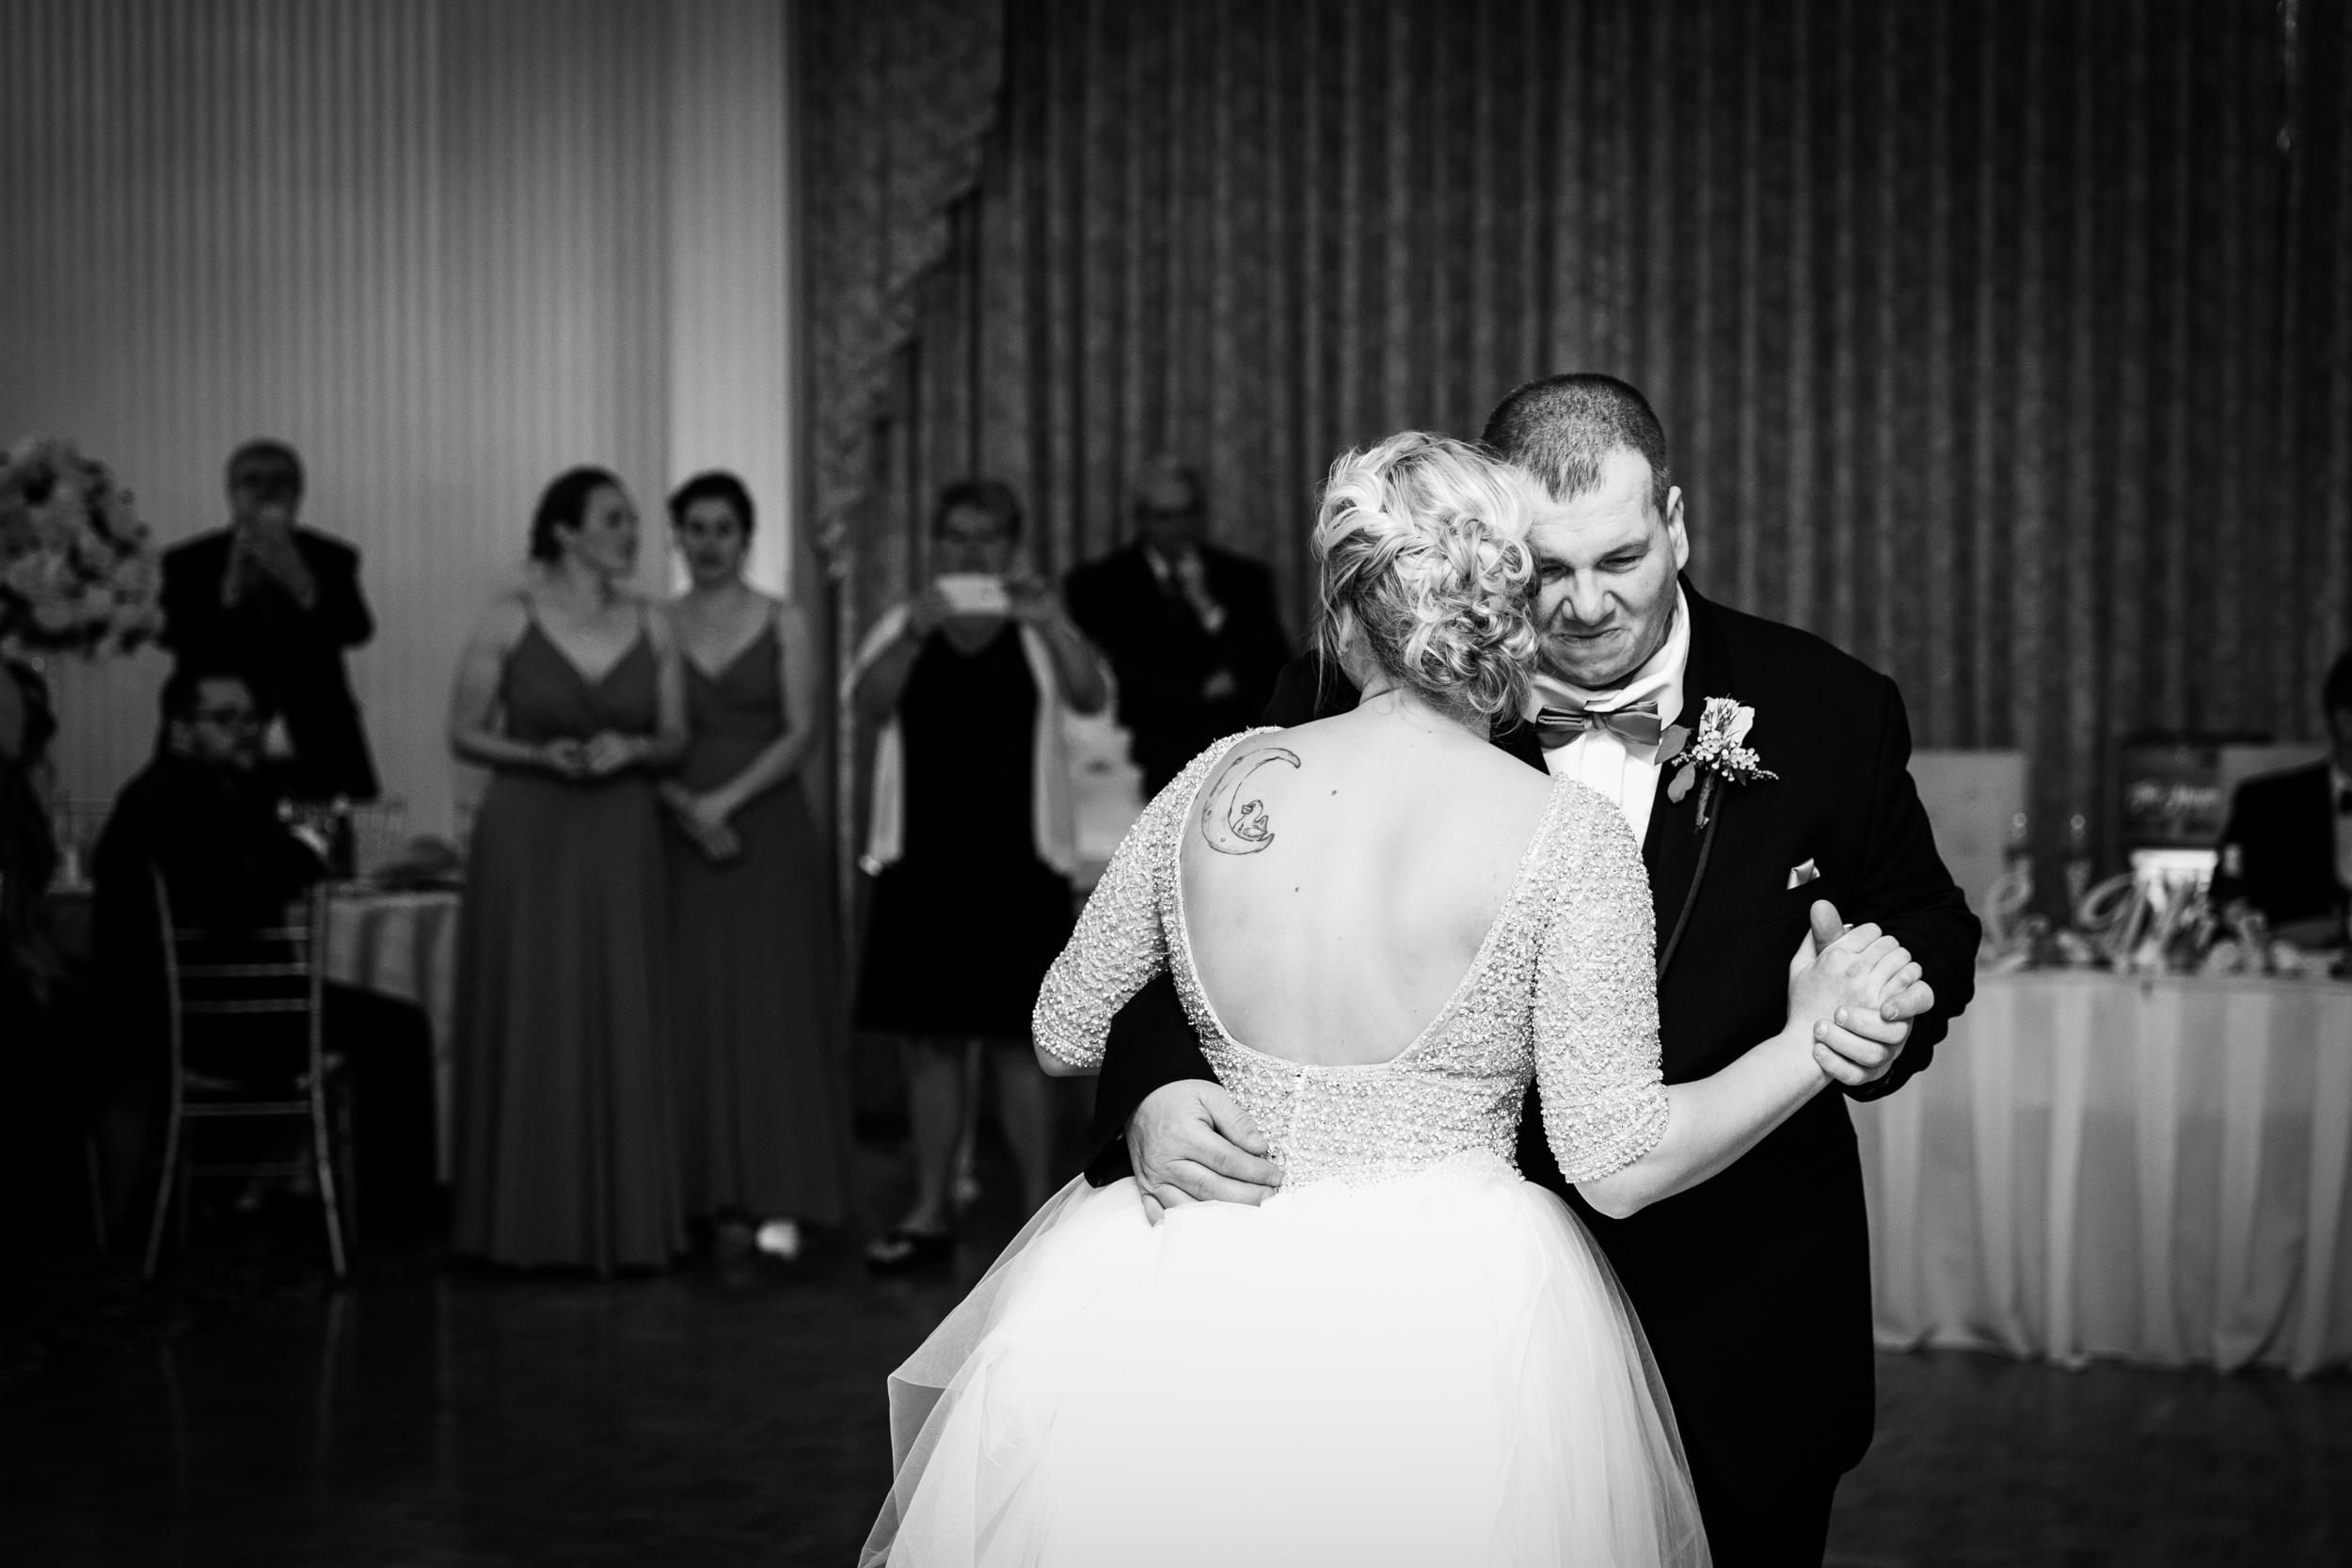 CELEBRATIONS BENSALEM WEDDING PHOTOGRAPHY-91.jpg